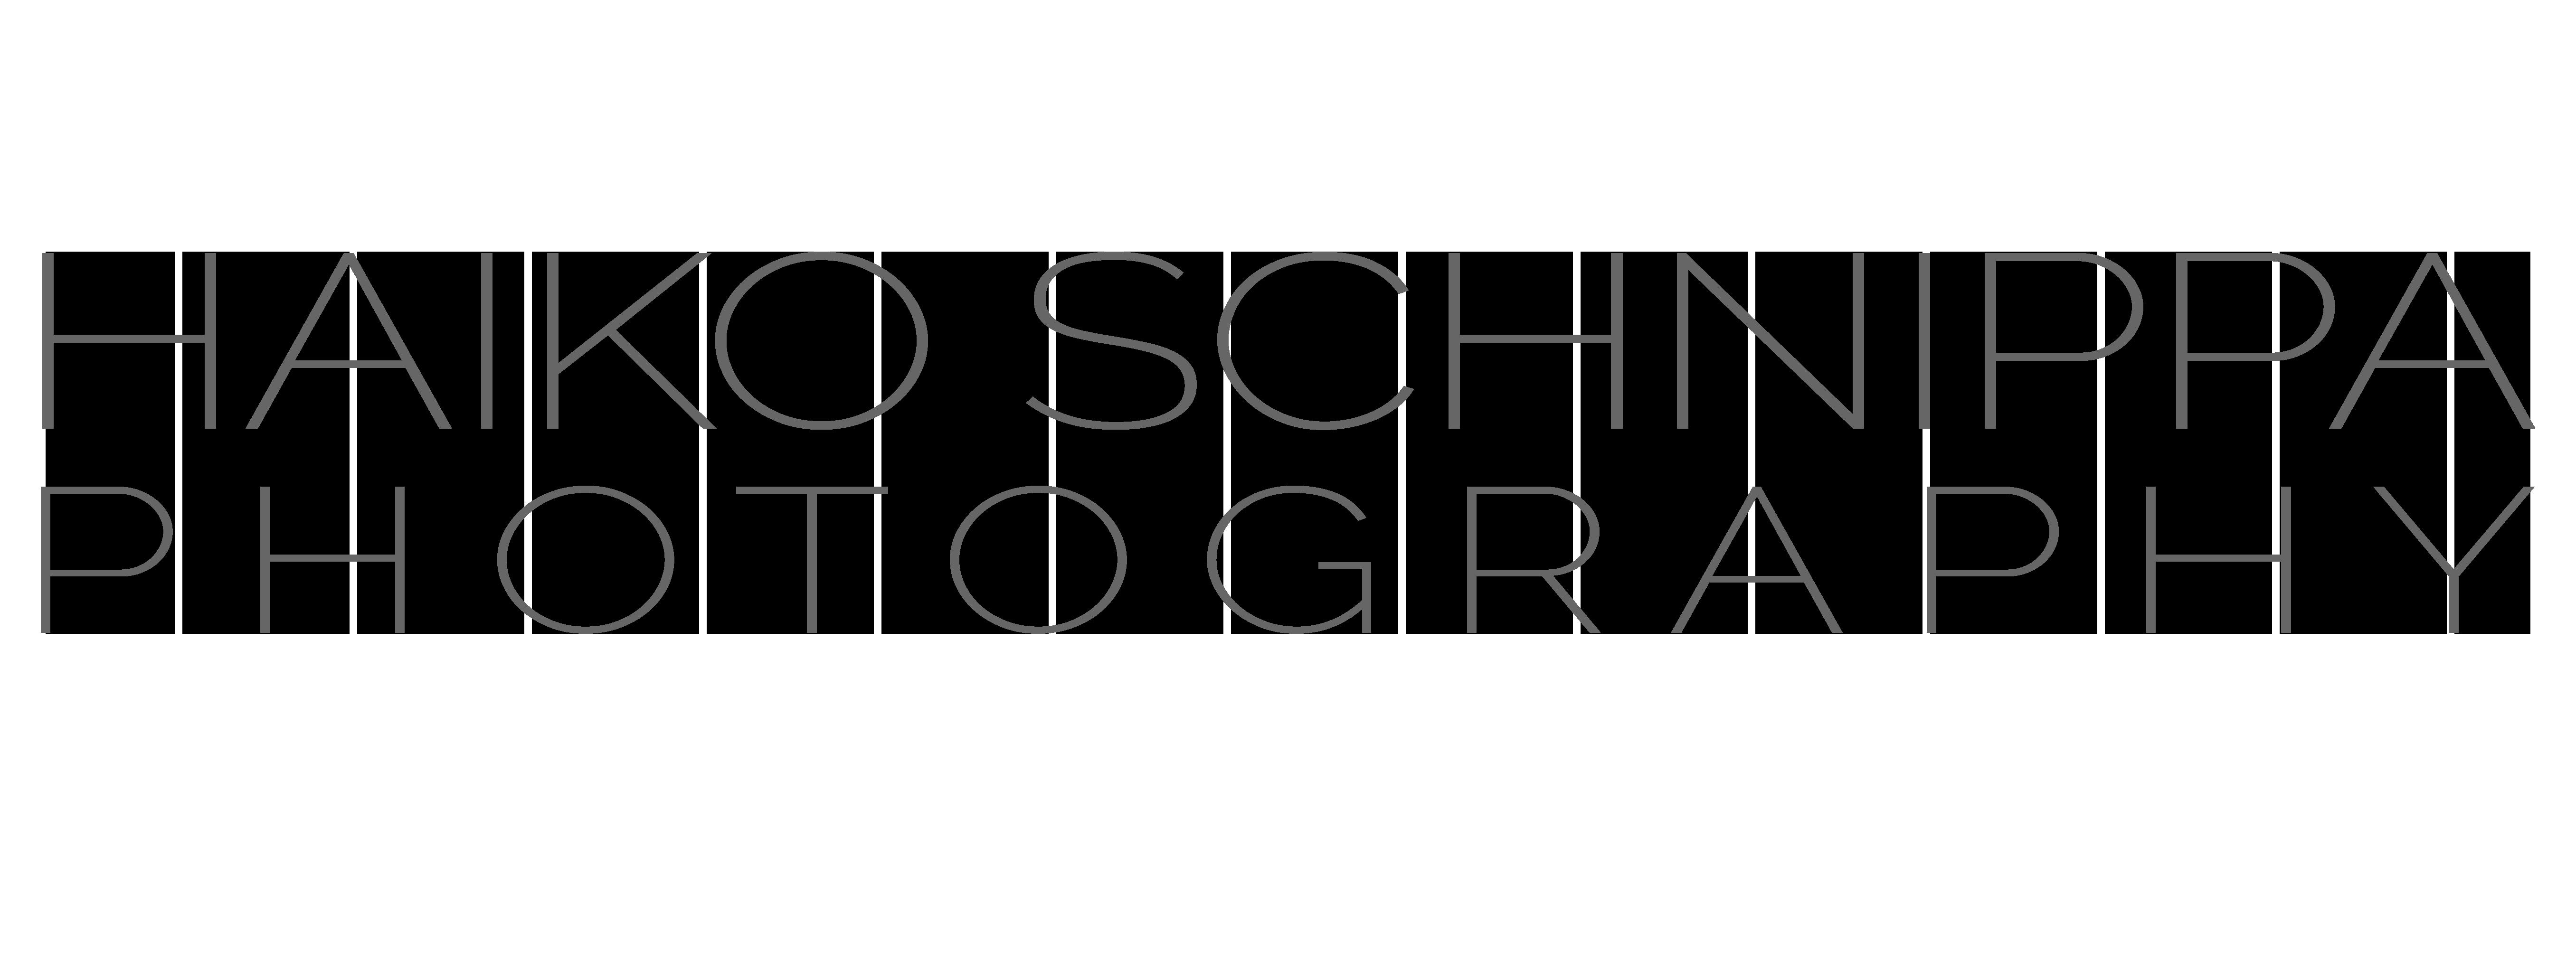 Haiko Schnippa Photography